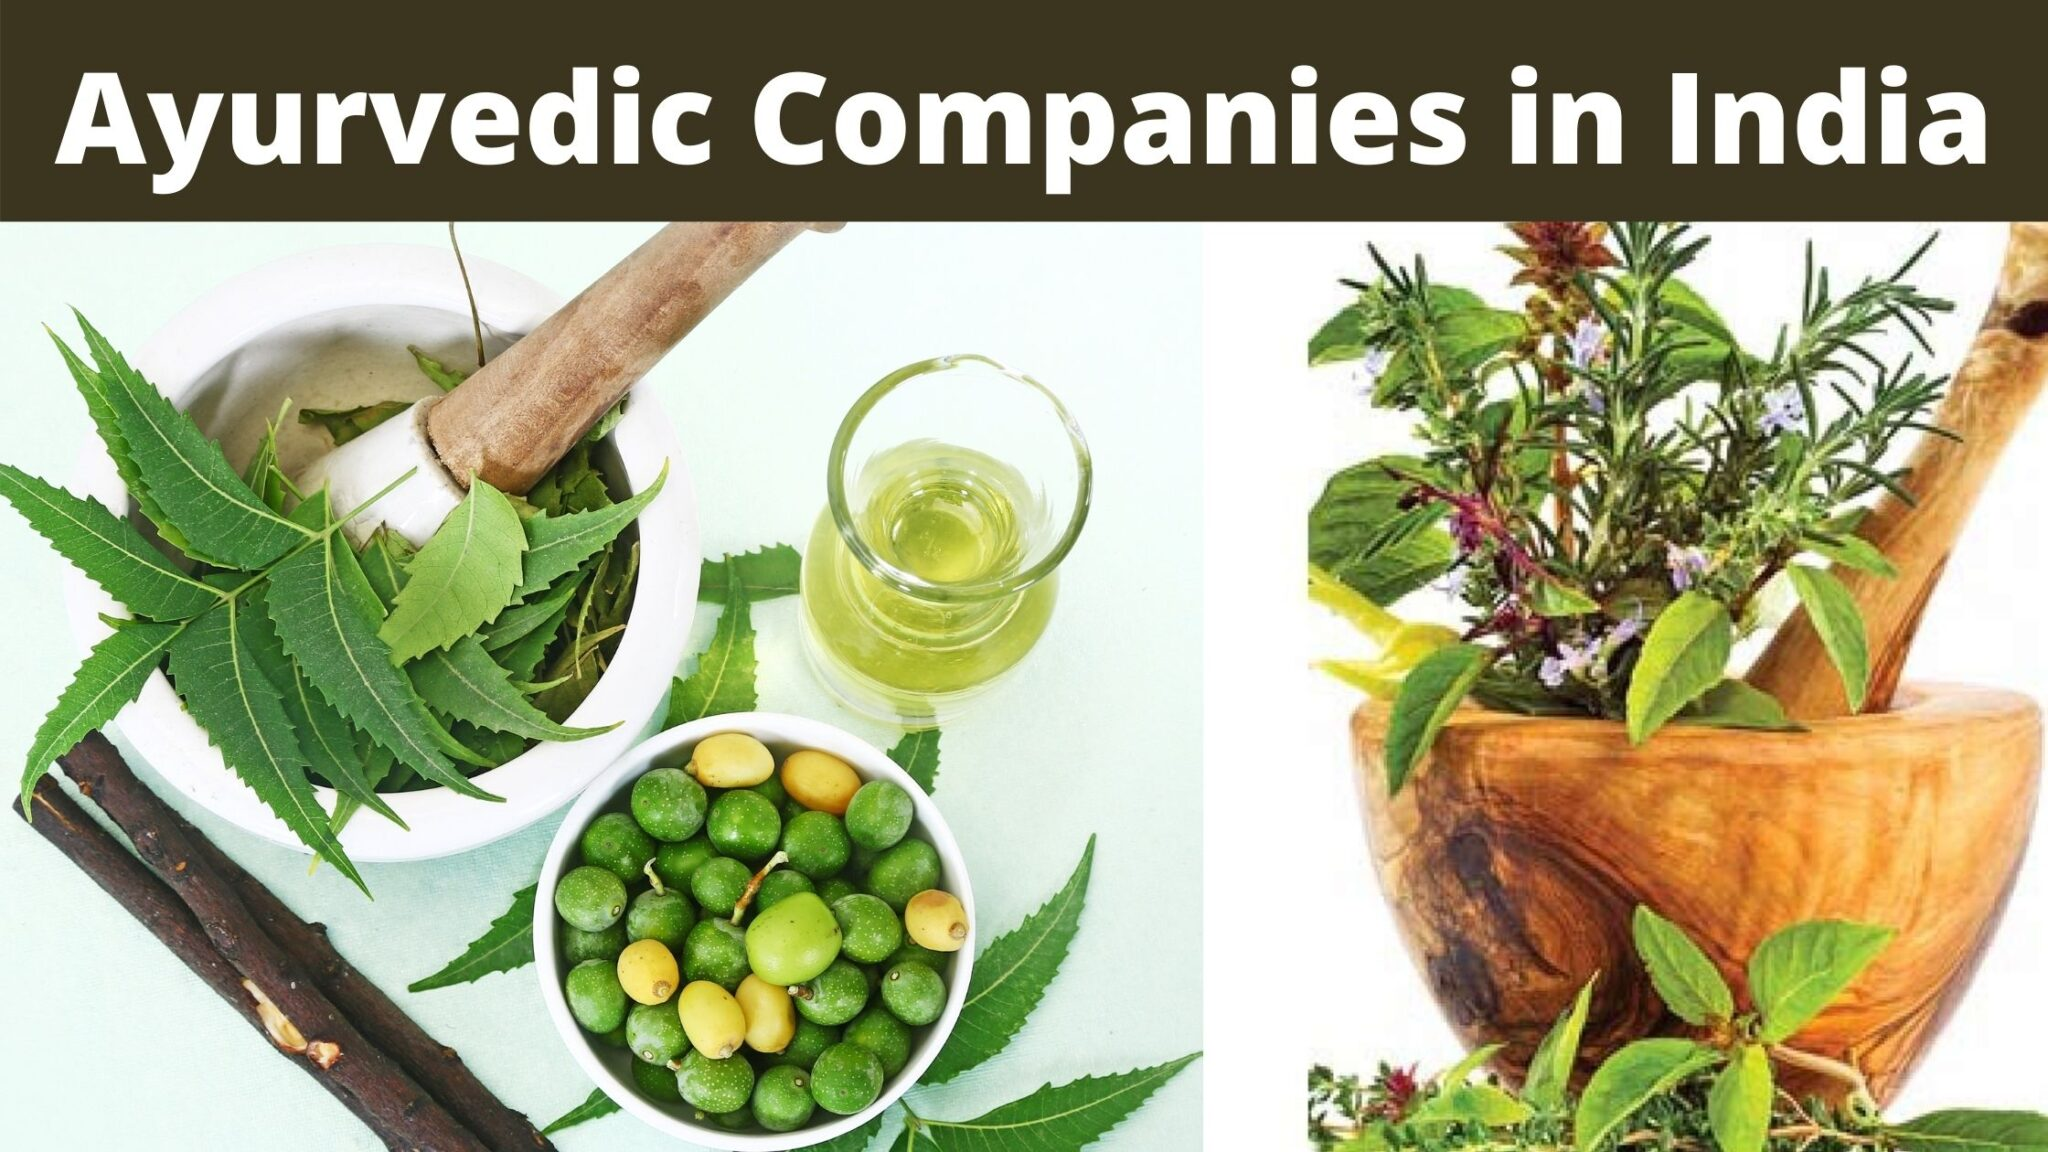 ayurvedic companies in india